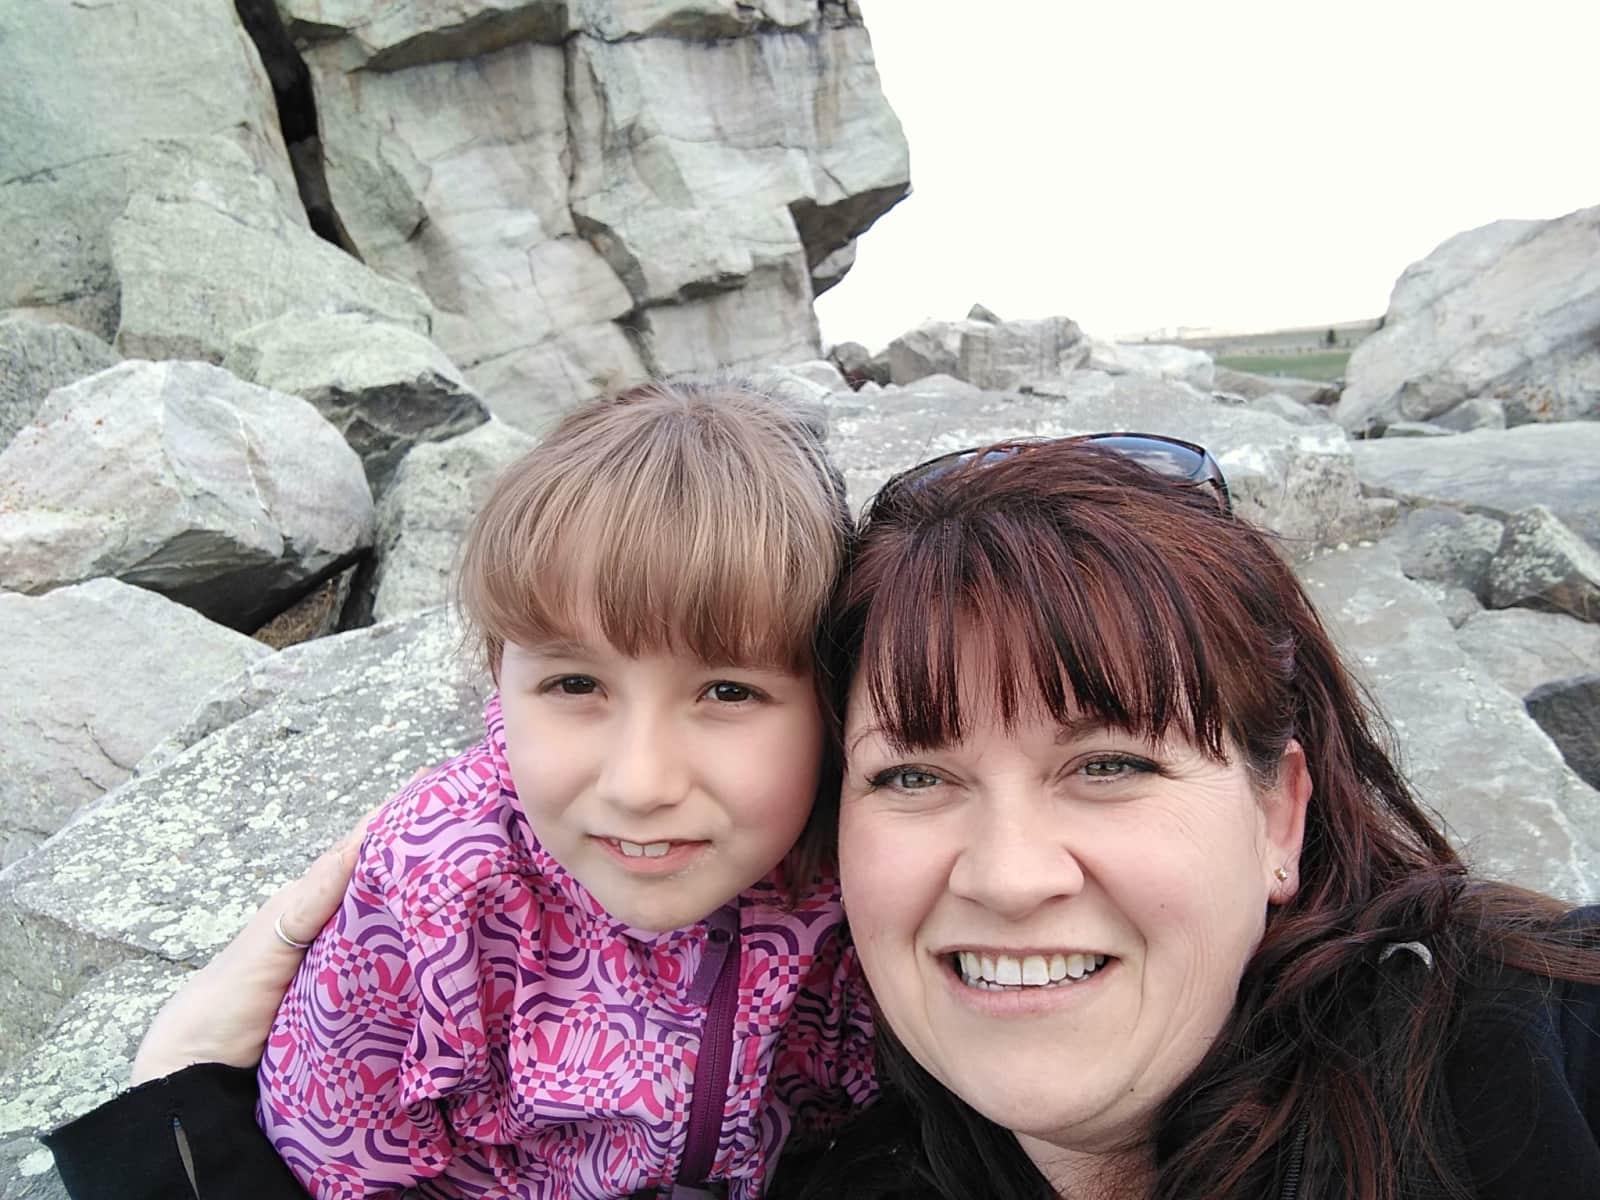 Jasona from High River, Alberta, Canada